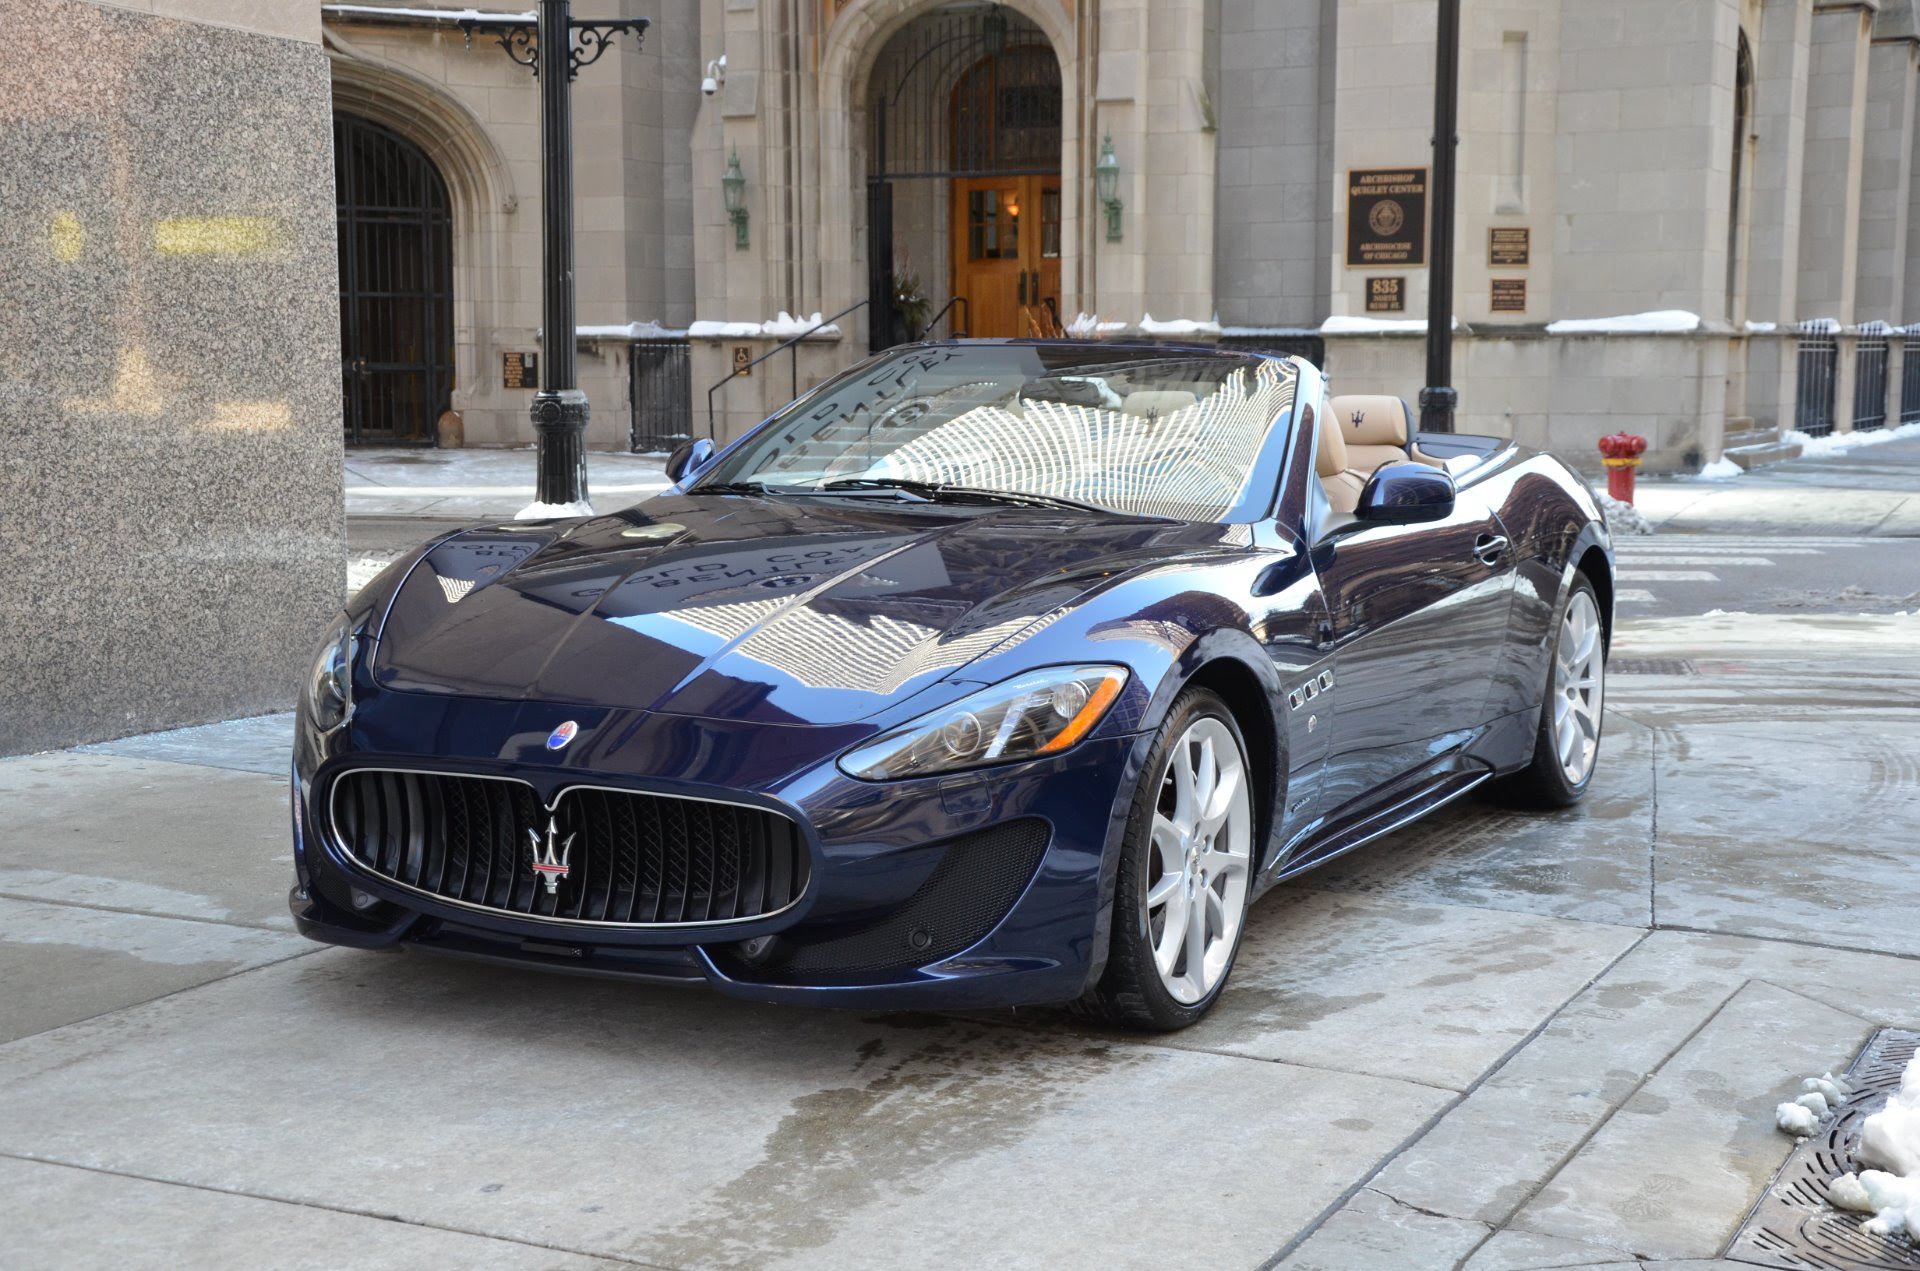 LUXURY FAST CARS WALLPAPERS: 2013 maserati granturismo convertible